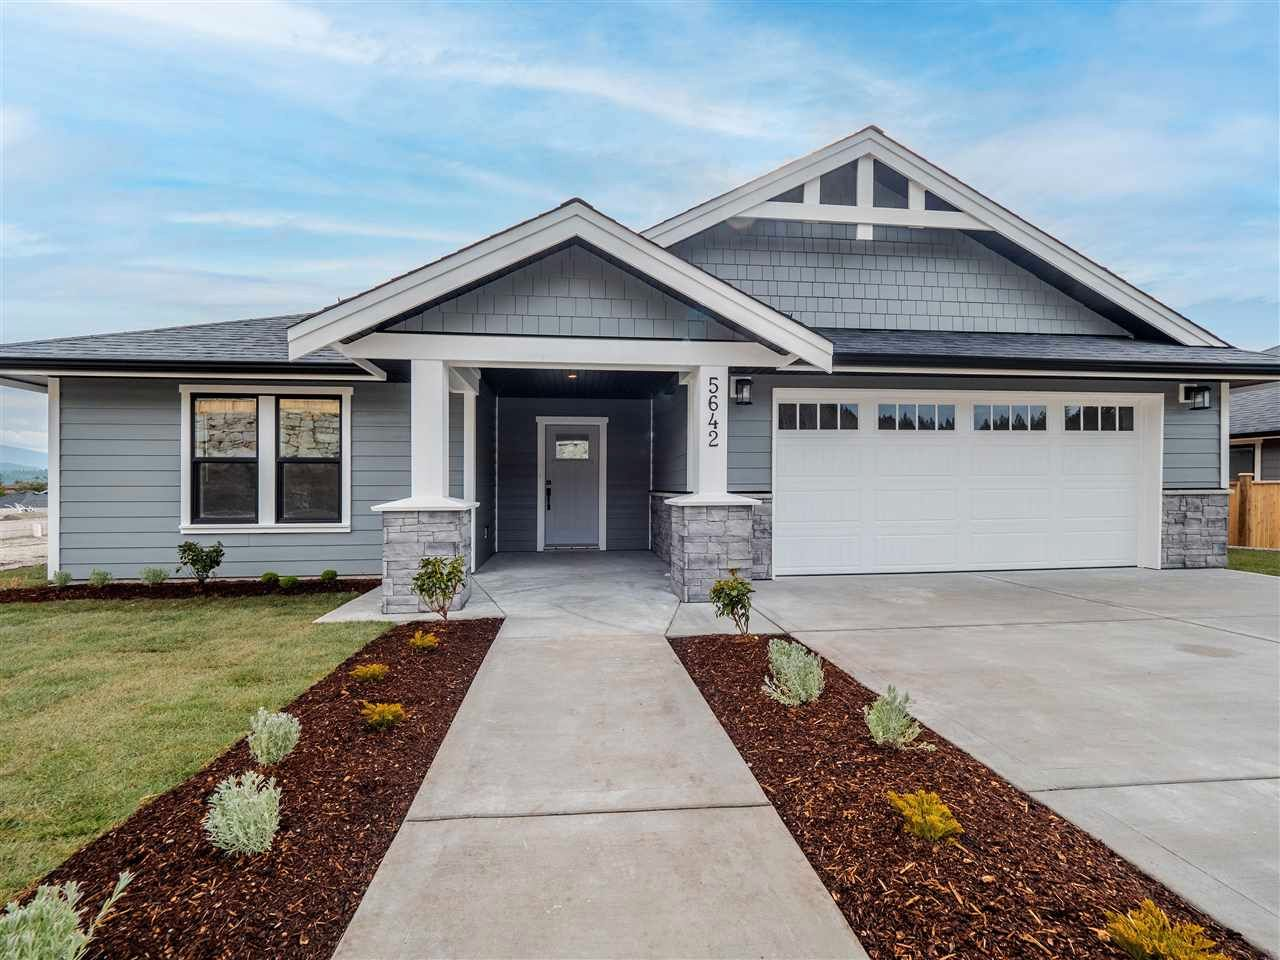 Main Photo: 5680 DERBY Road in Sechelt: Sechelt District House for sale (Sunshine Coast)  : MLS®# R2576679